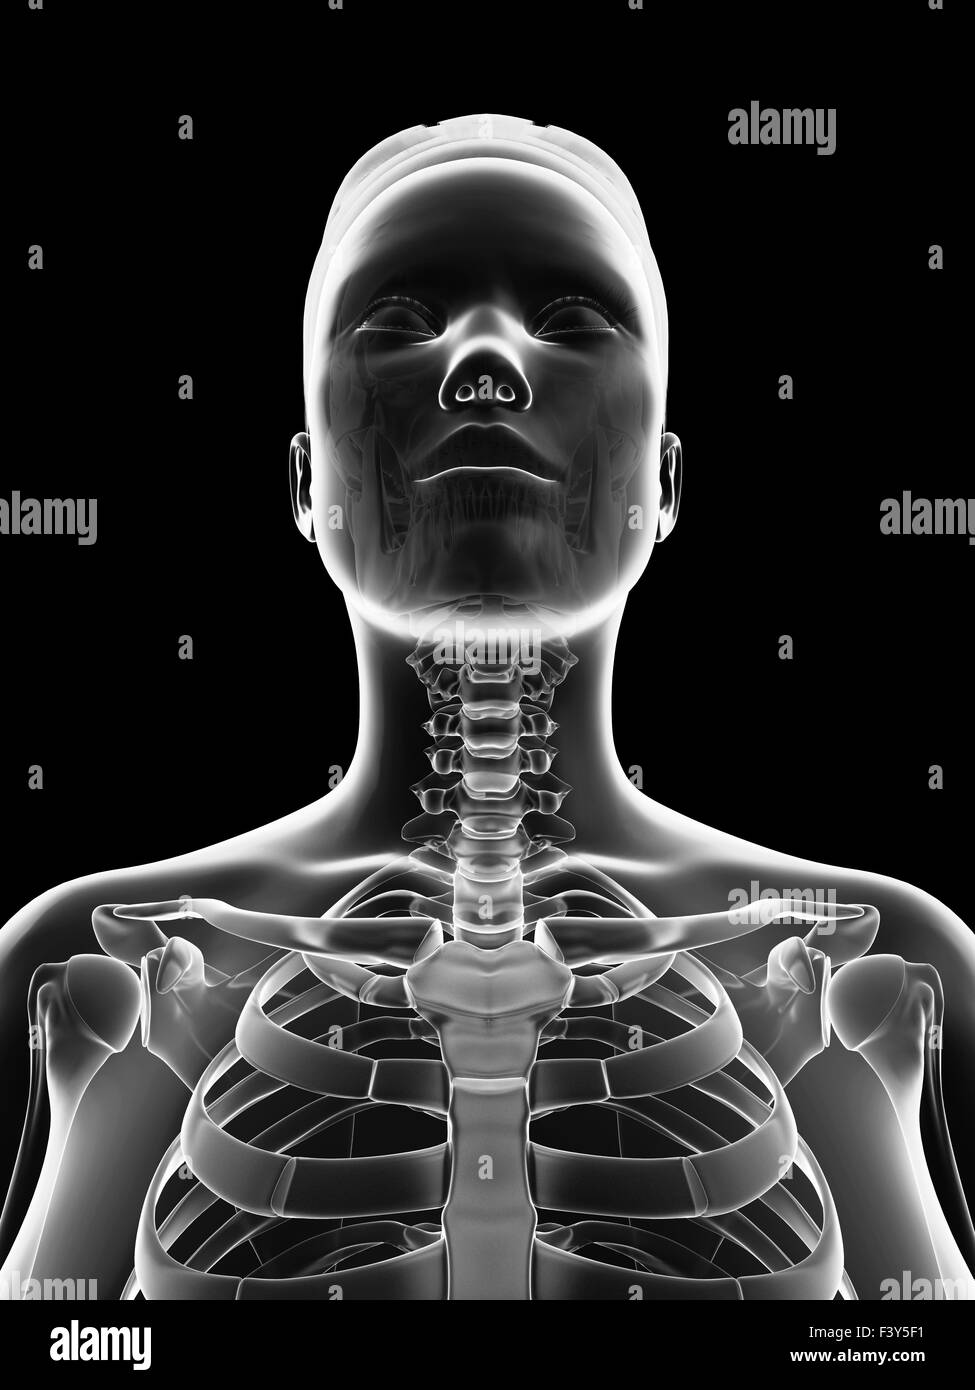 Normal neck bones stock photos normal neck bones stock images alamy transparent female skeleton neck stock image ccuart Gallery